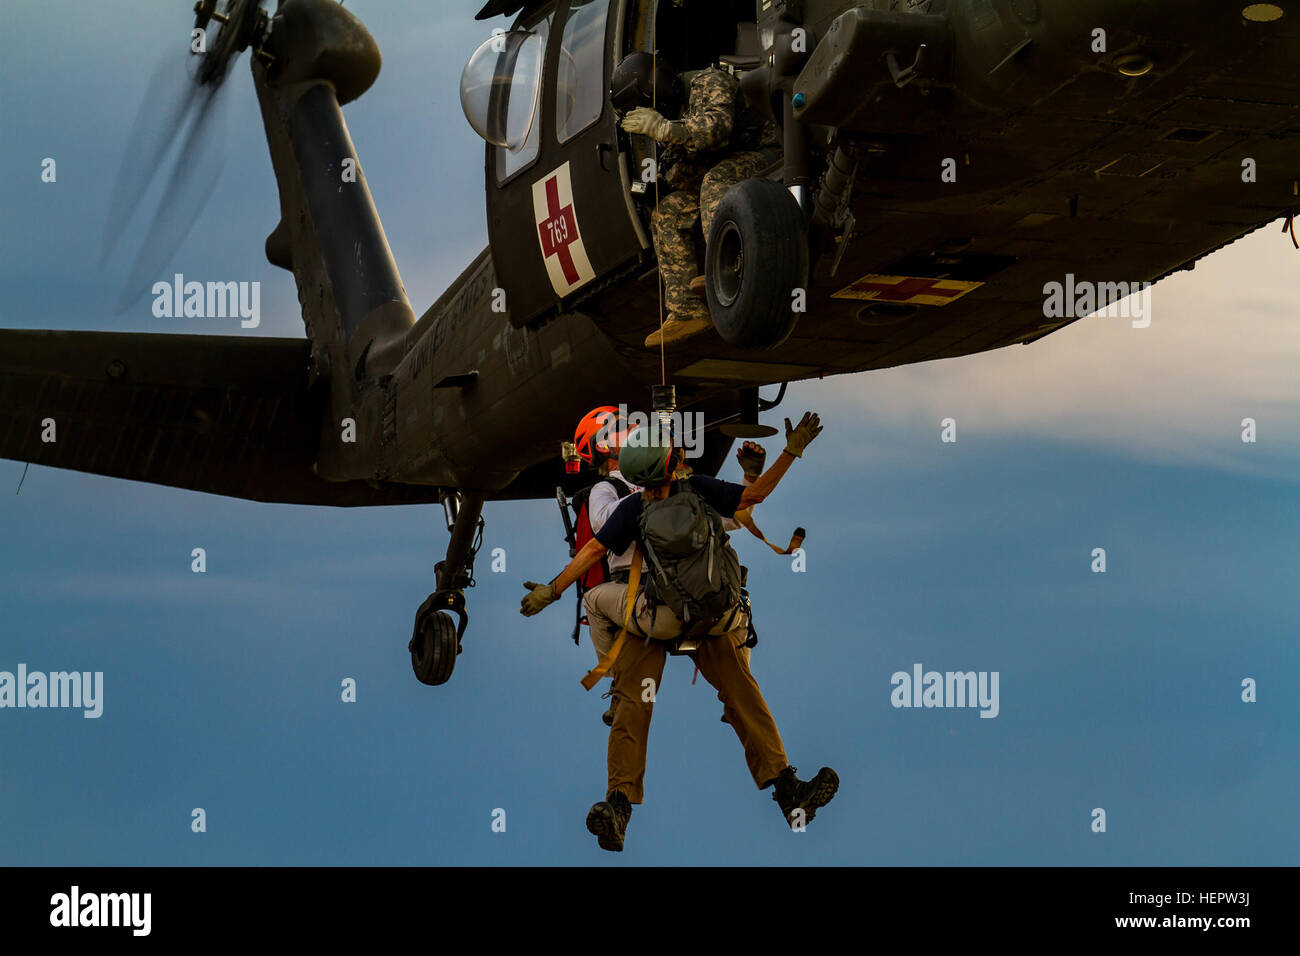 Elicottero 007 : 007 almost immagini & 007 almost fotos stock alamy